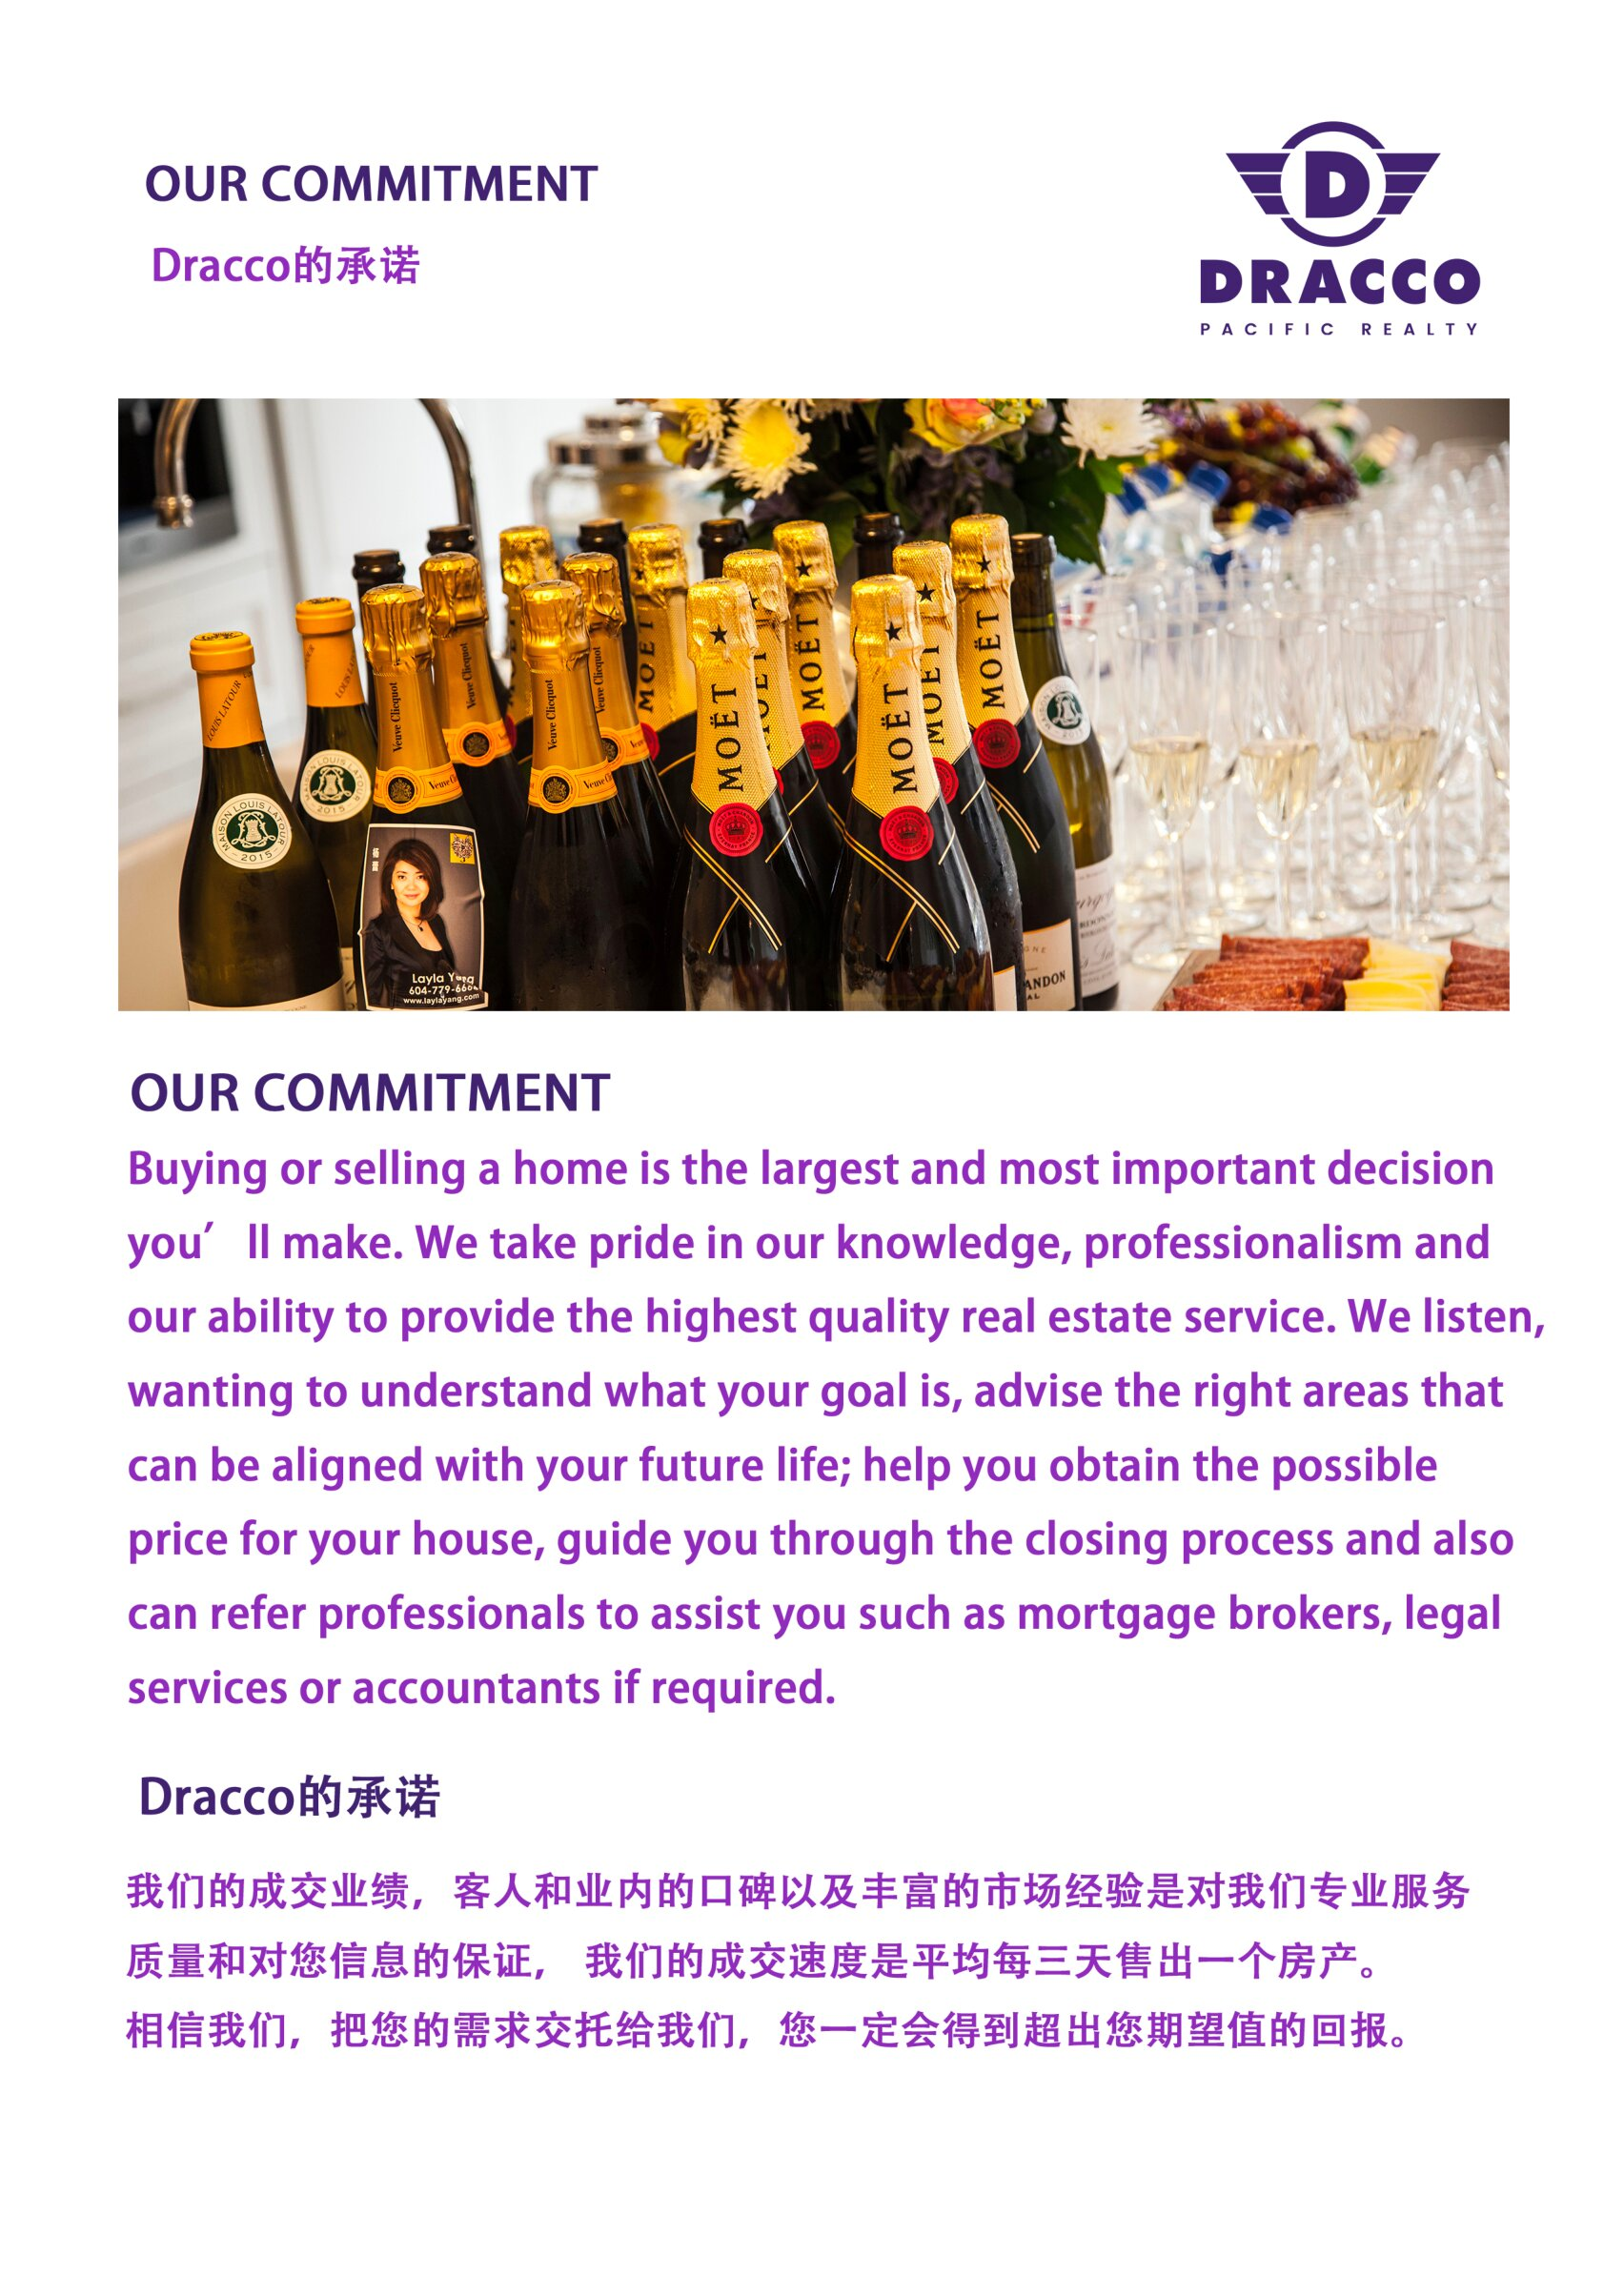 2020 dracco brochure 0011